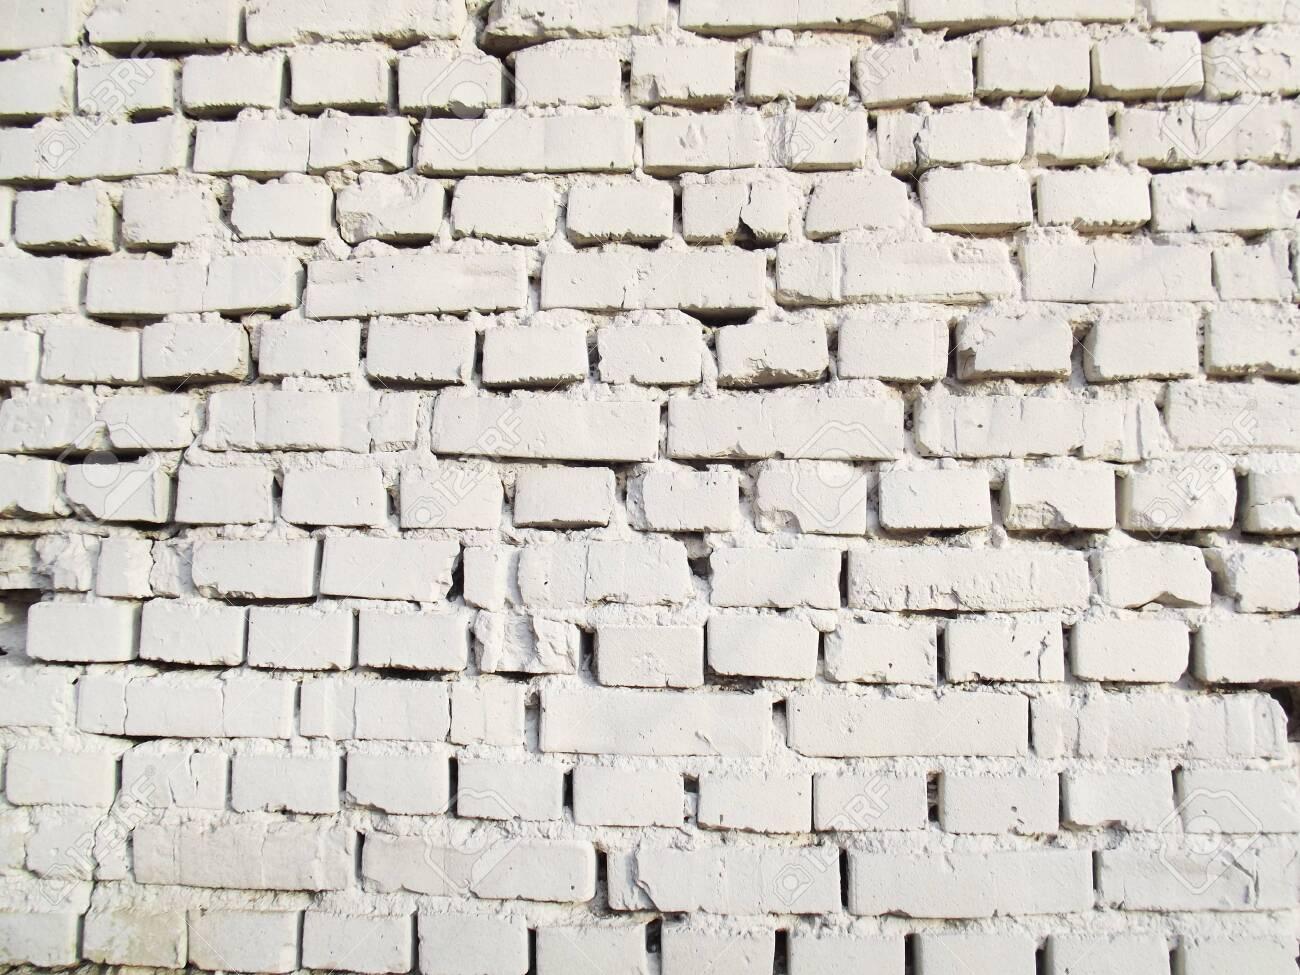 White brick wall. Grunge texture. Vintage brickwall masonry - 135070149